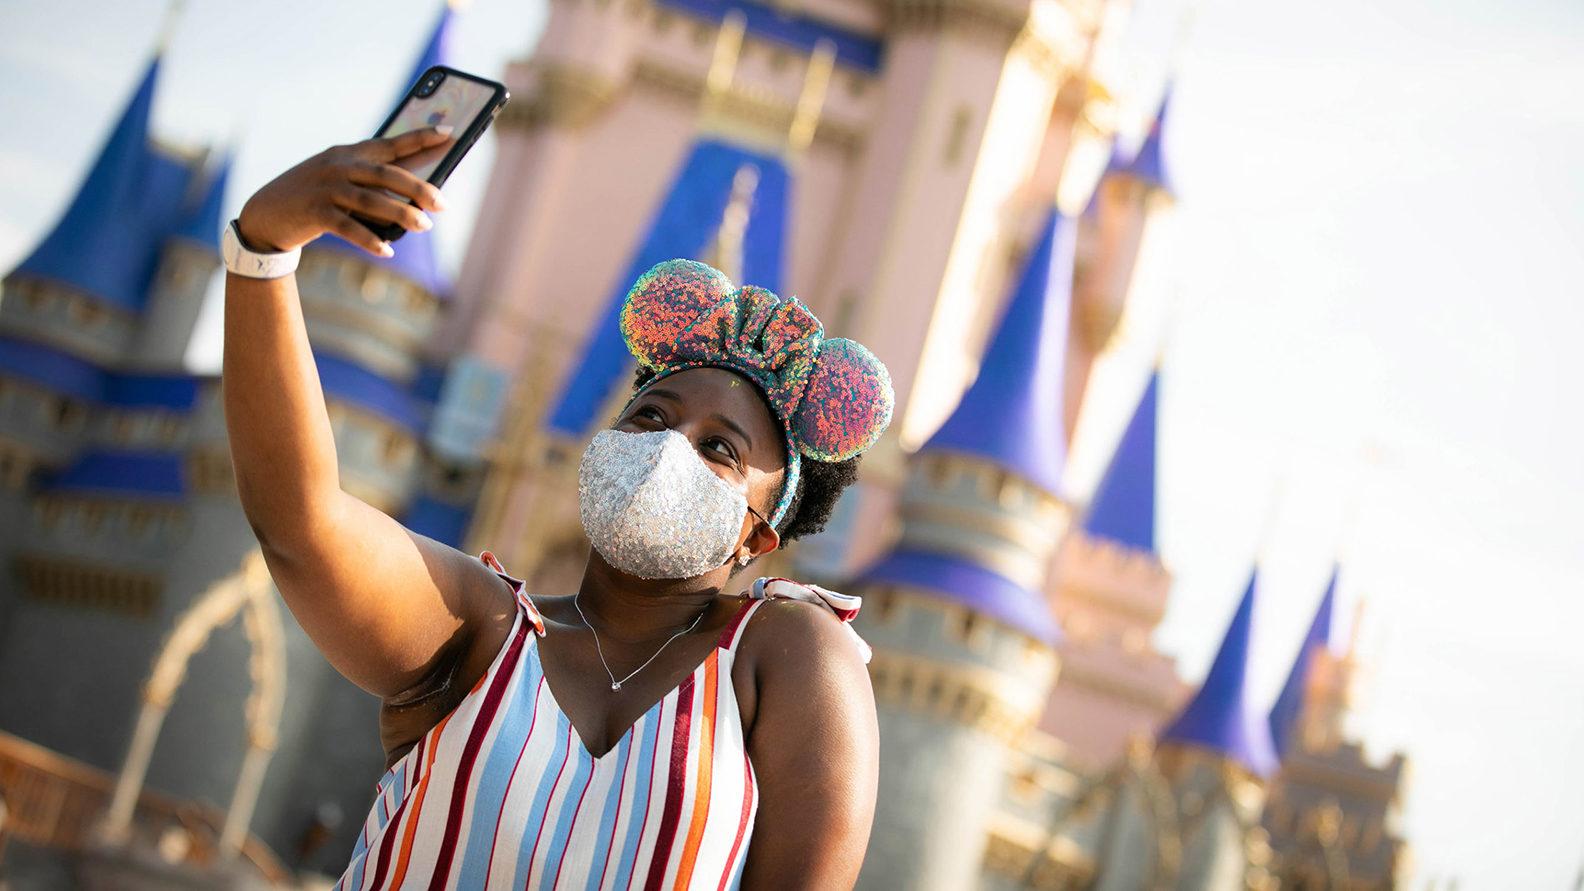 5 Tips for Planning Walt Disney World Trip in 2020